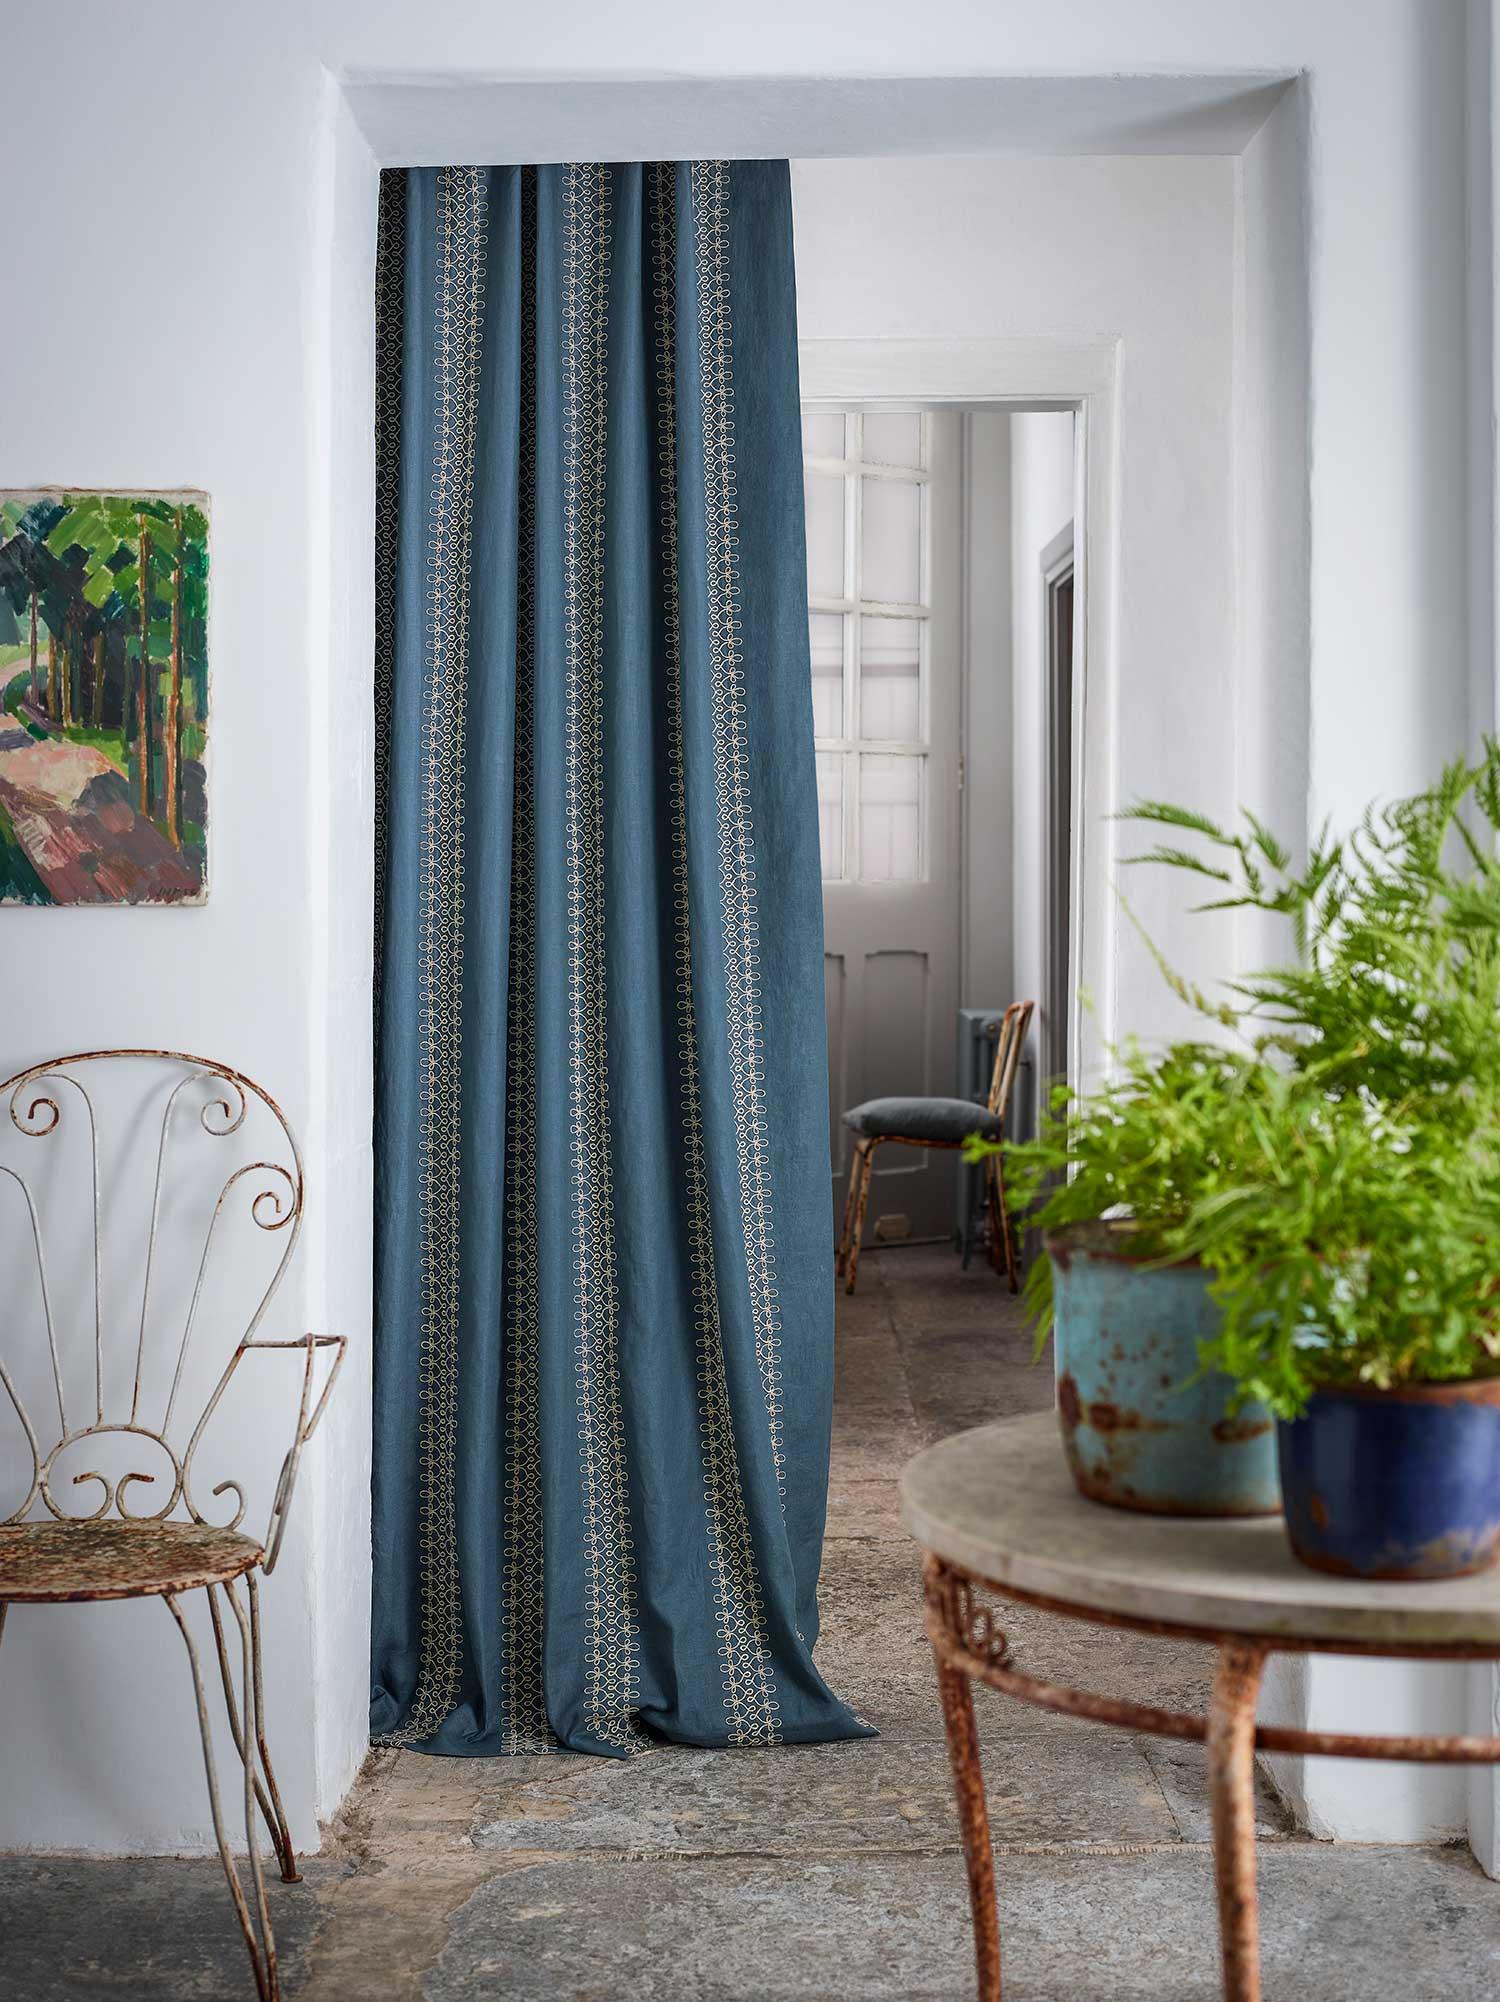 arredamento per la casa a roma ostia e casal palocco. Black Bedroom Furniture Sets. Home Design Ideas